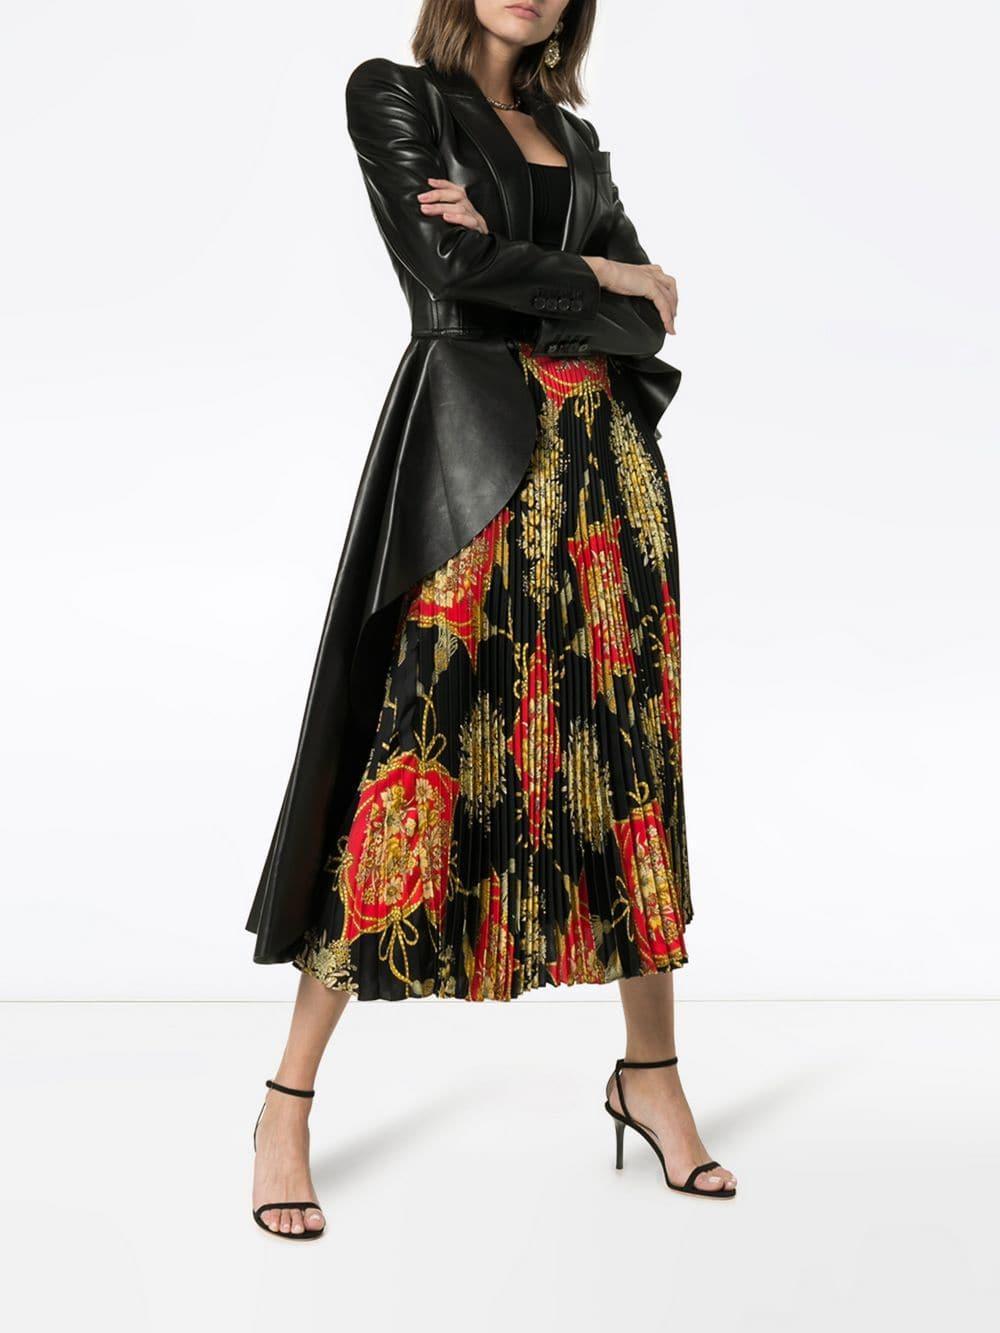 79784493438a82 Gucci Baroque Print Pleated Silk Midi Skirt in Black - Lyst